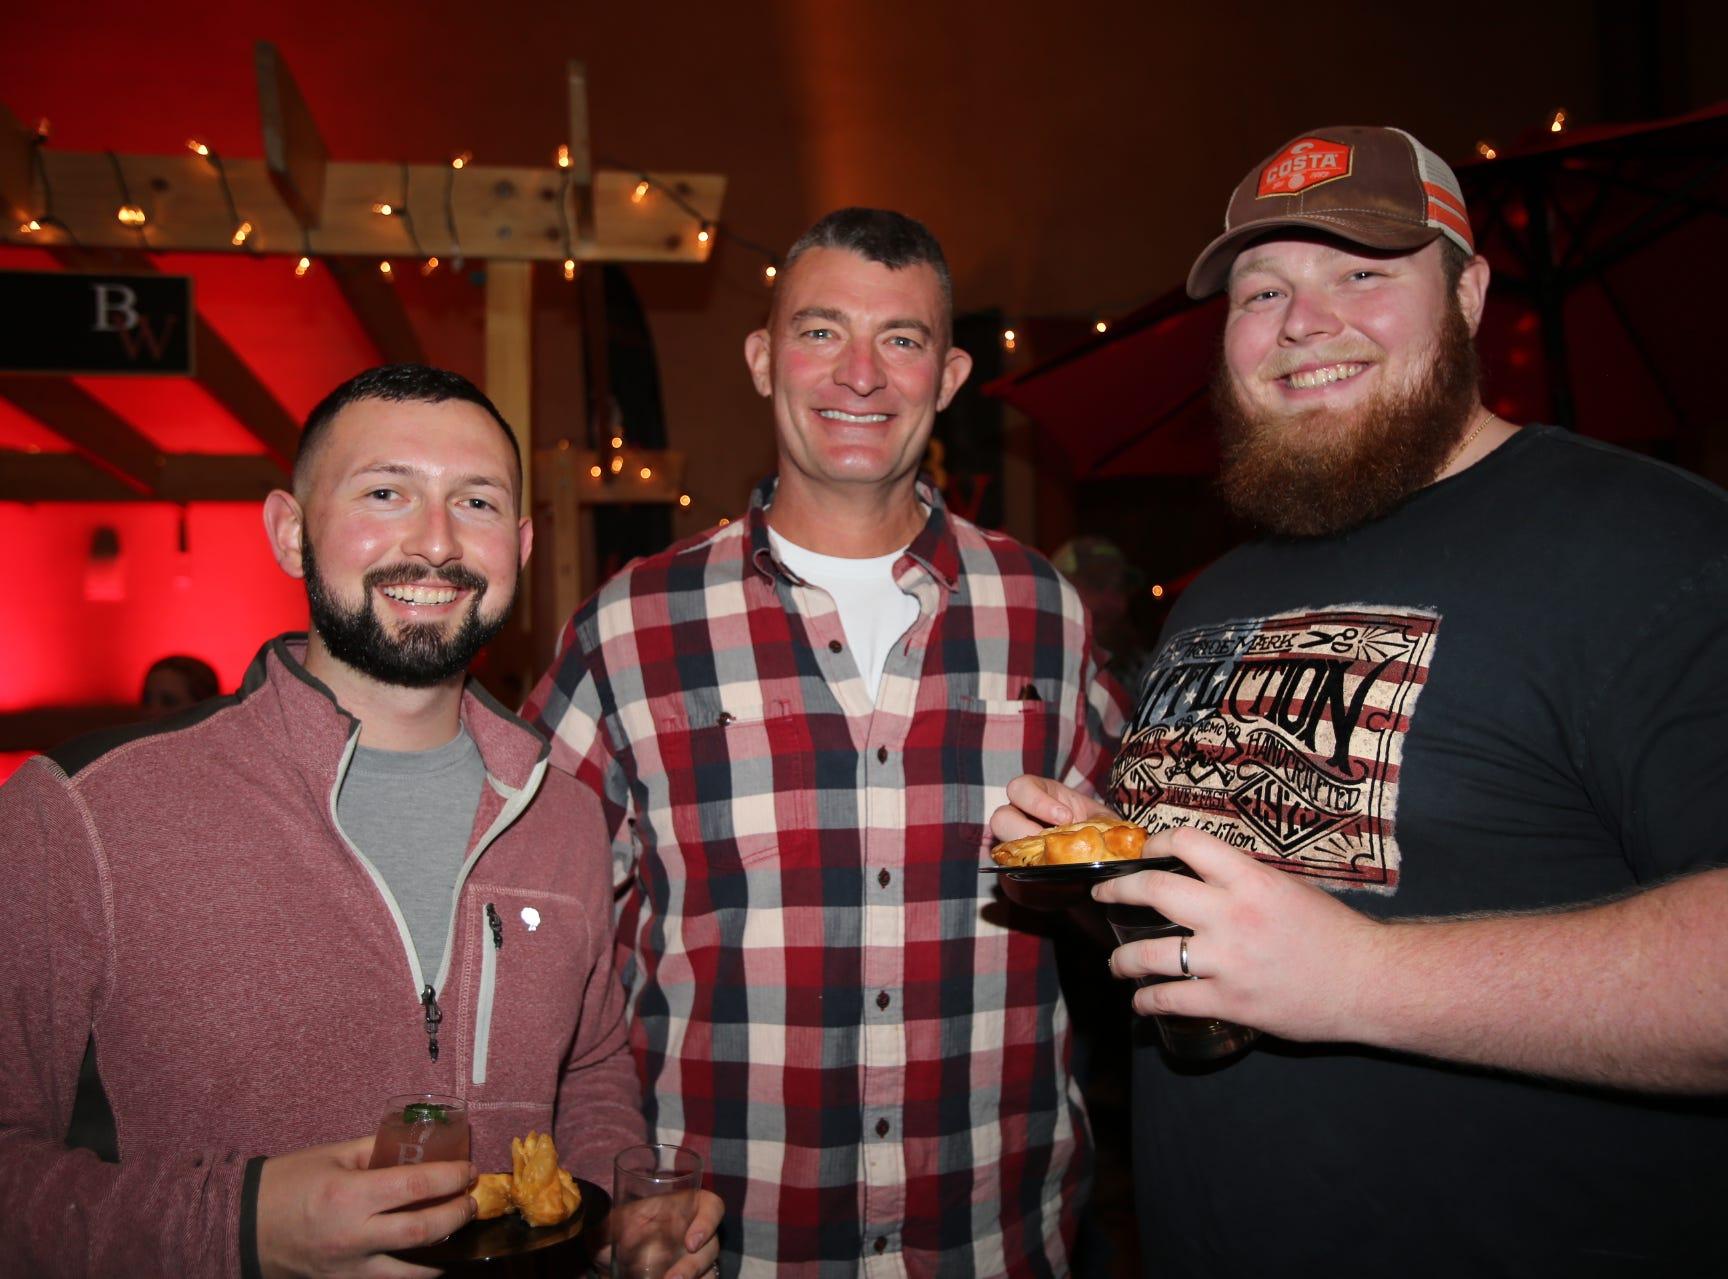 Jordan Eickmeyer, Dr Mark Massey, and Bob Massey